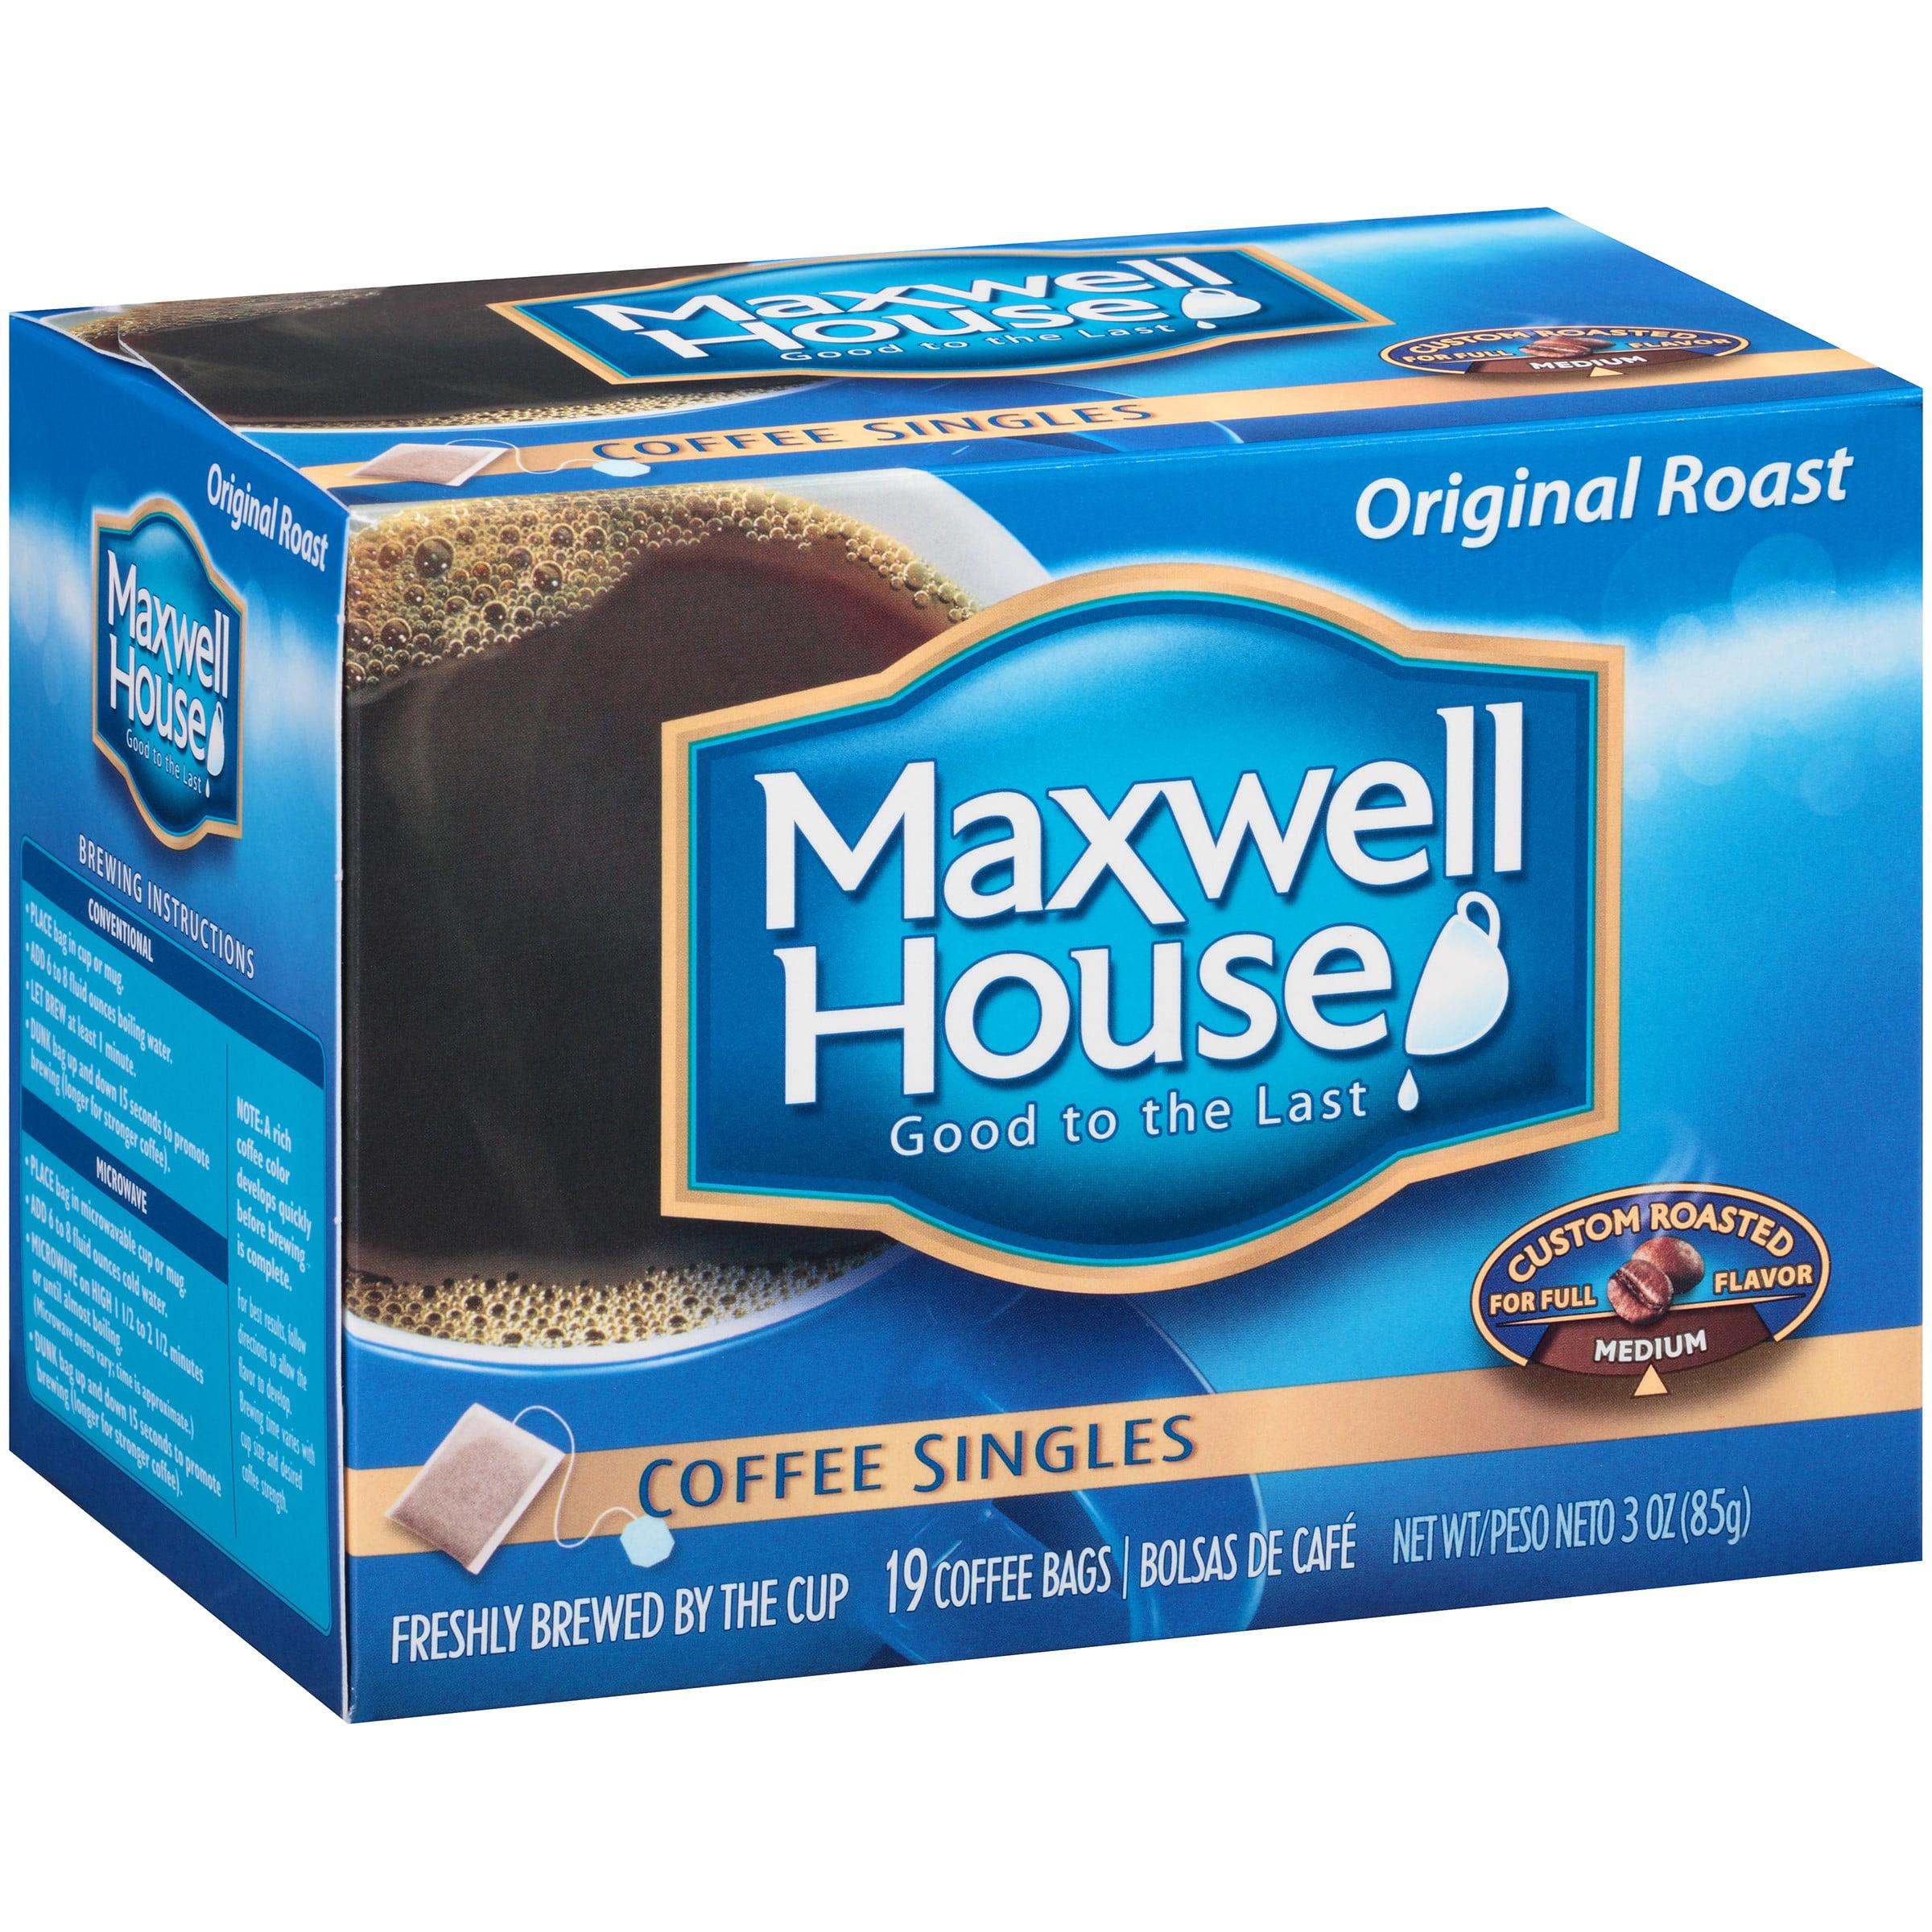 Maxwell House Original Medium Roast Coffee Singles, 19 count, Box